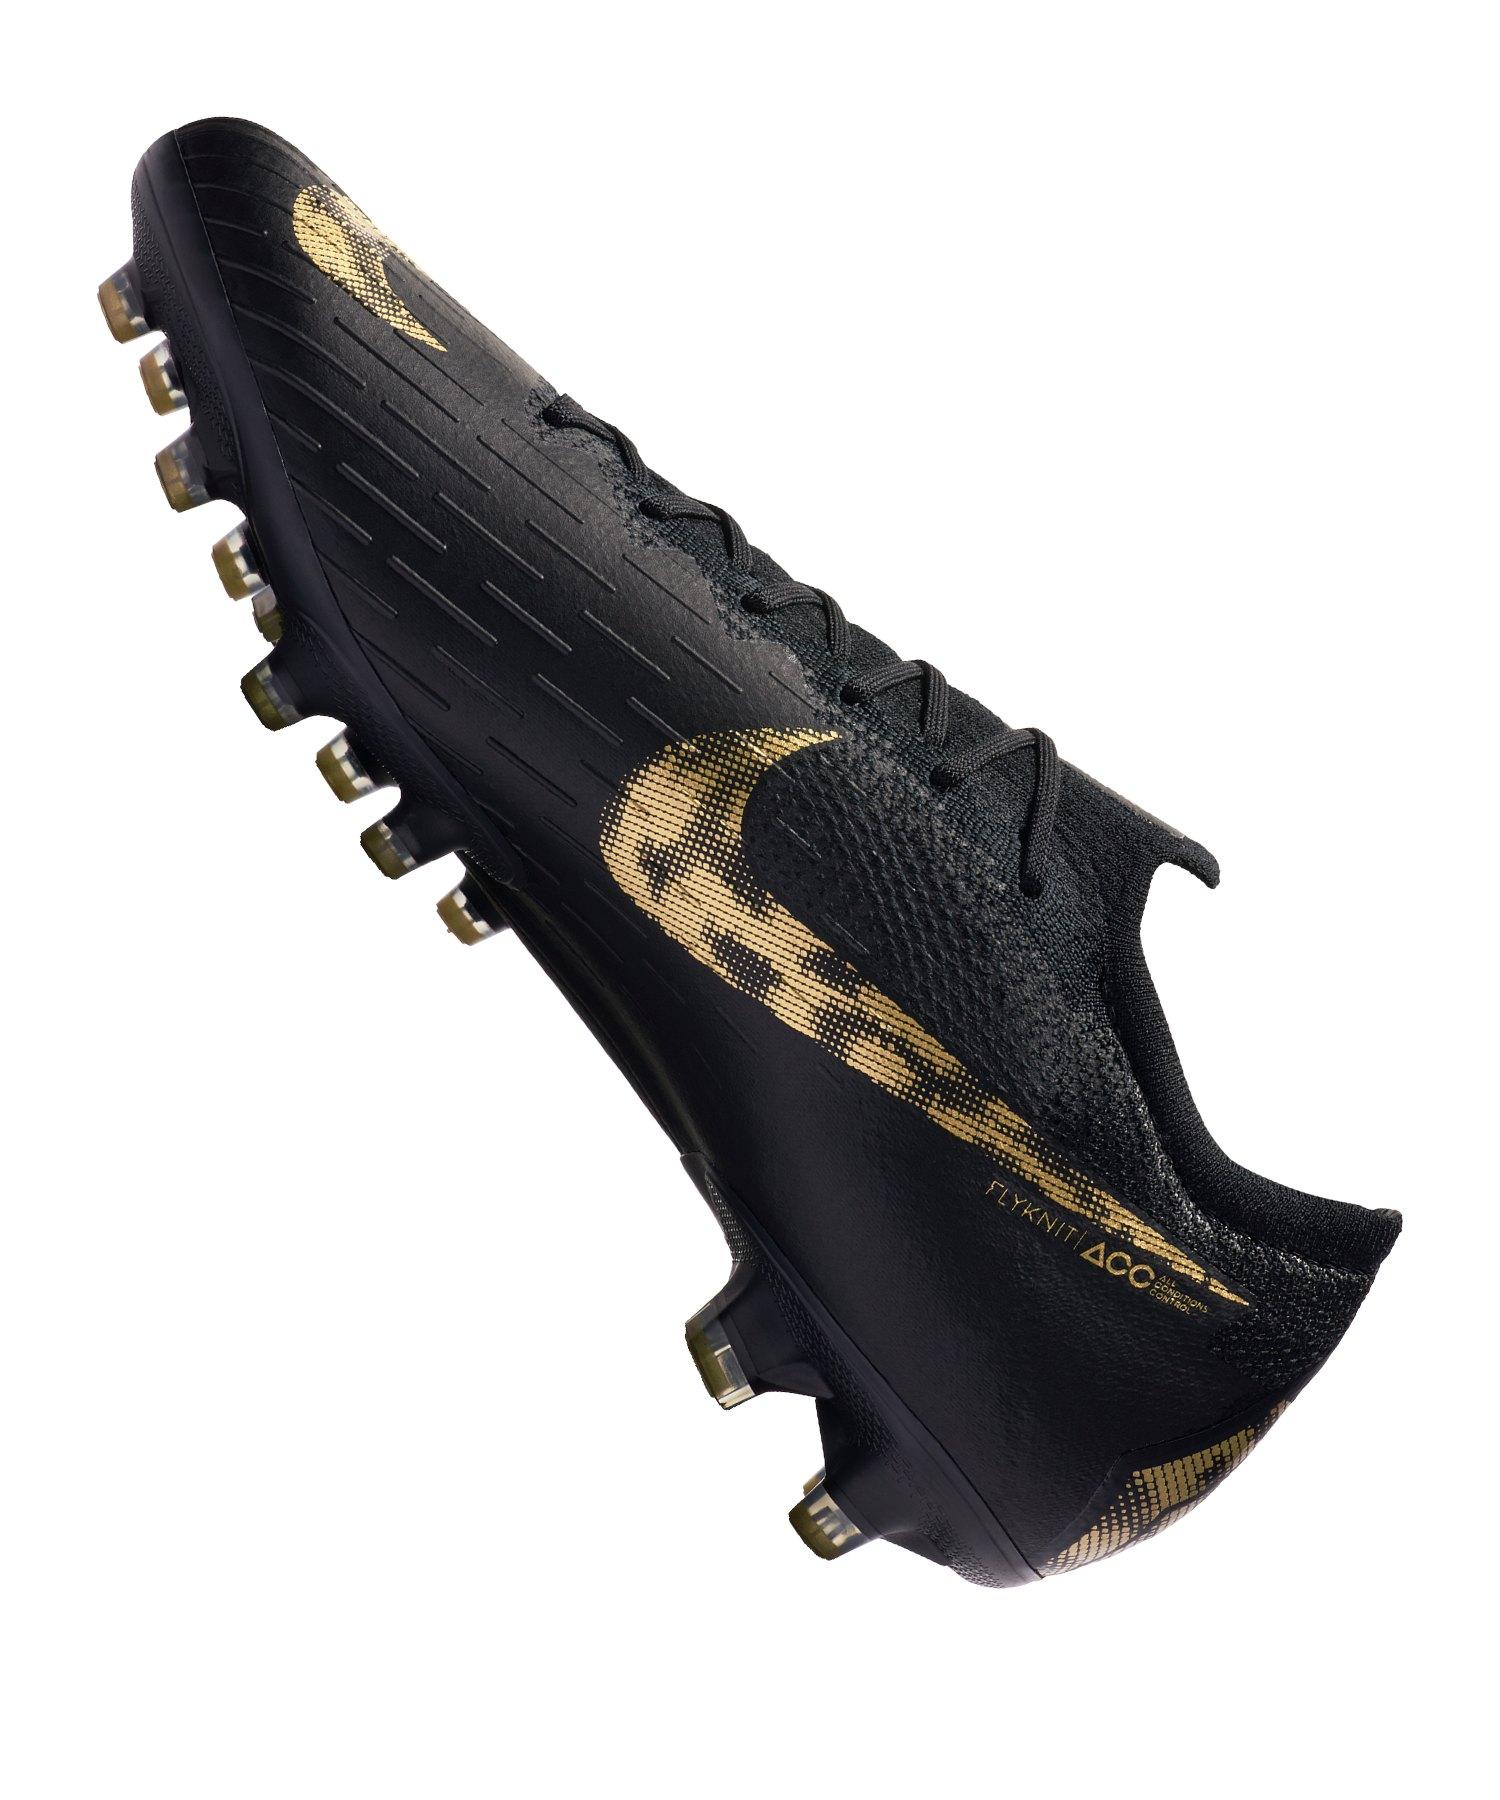 Pro Elite Schwarz Nike Mercurial Ag Vapor Xii F077 hrtxsQdCB